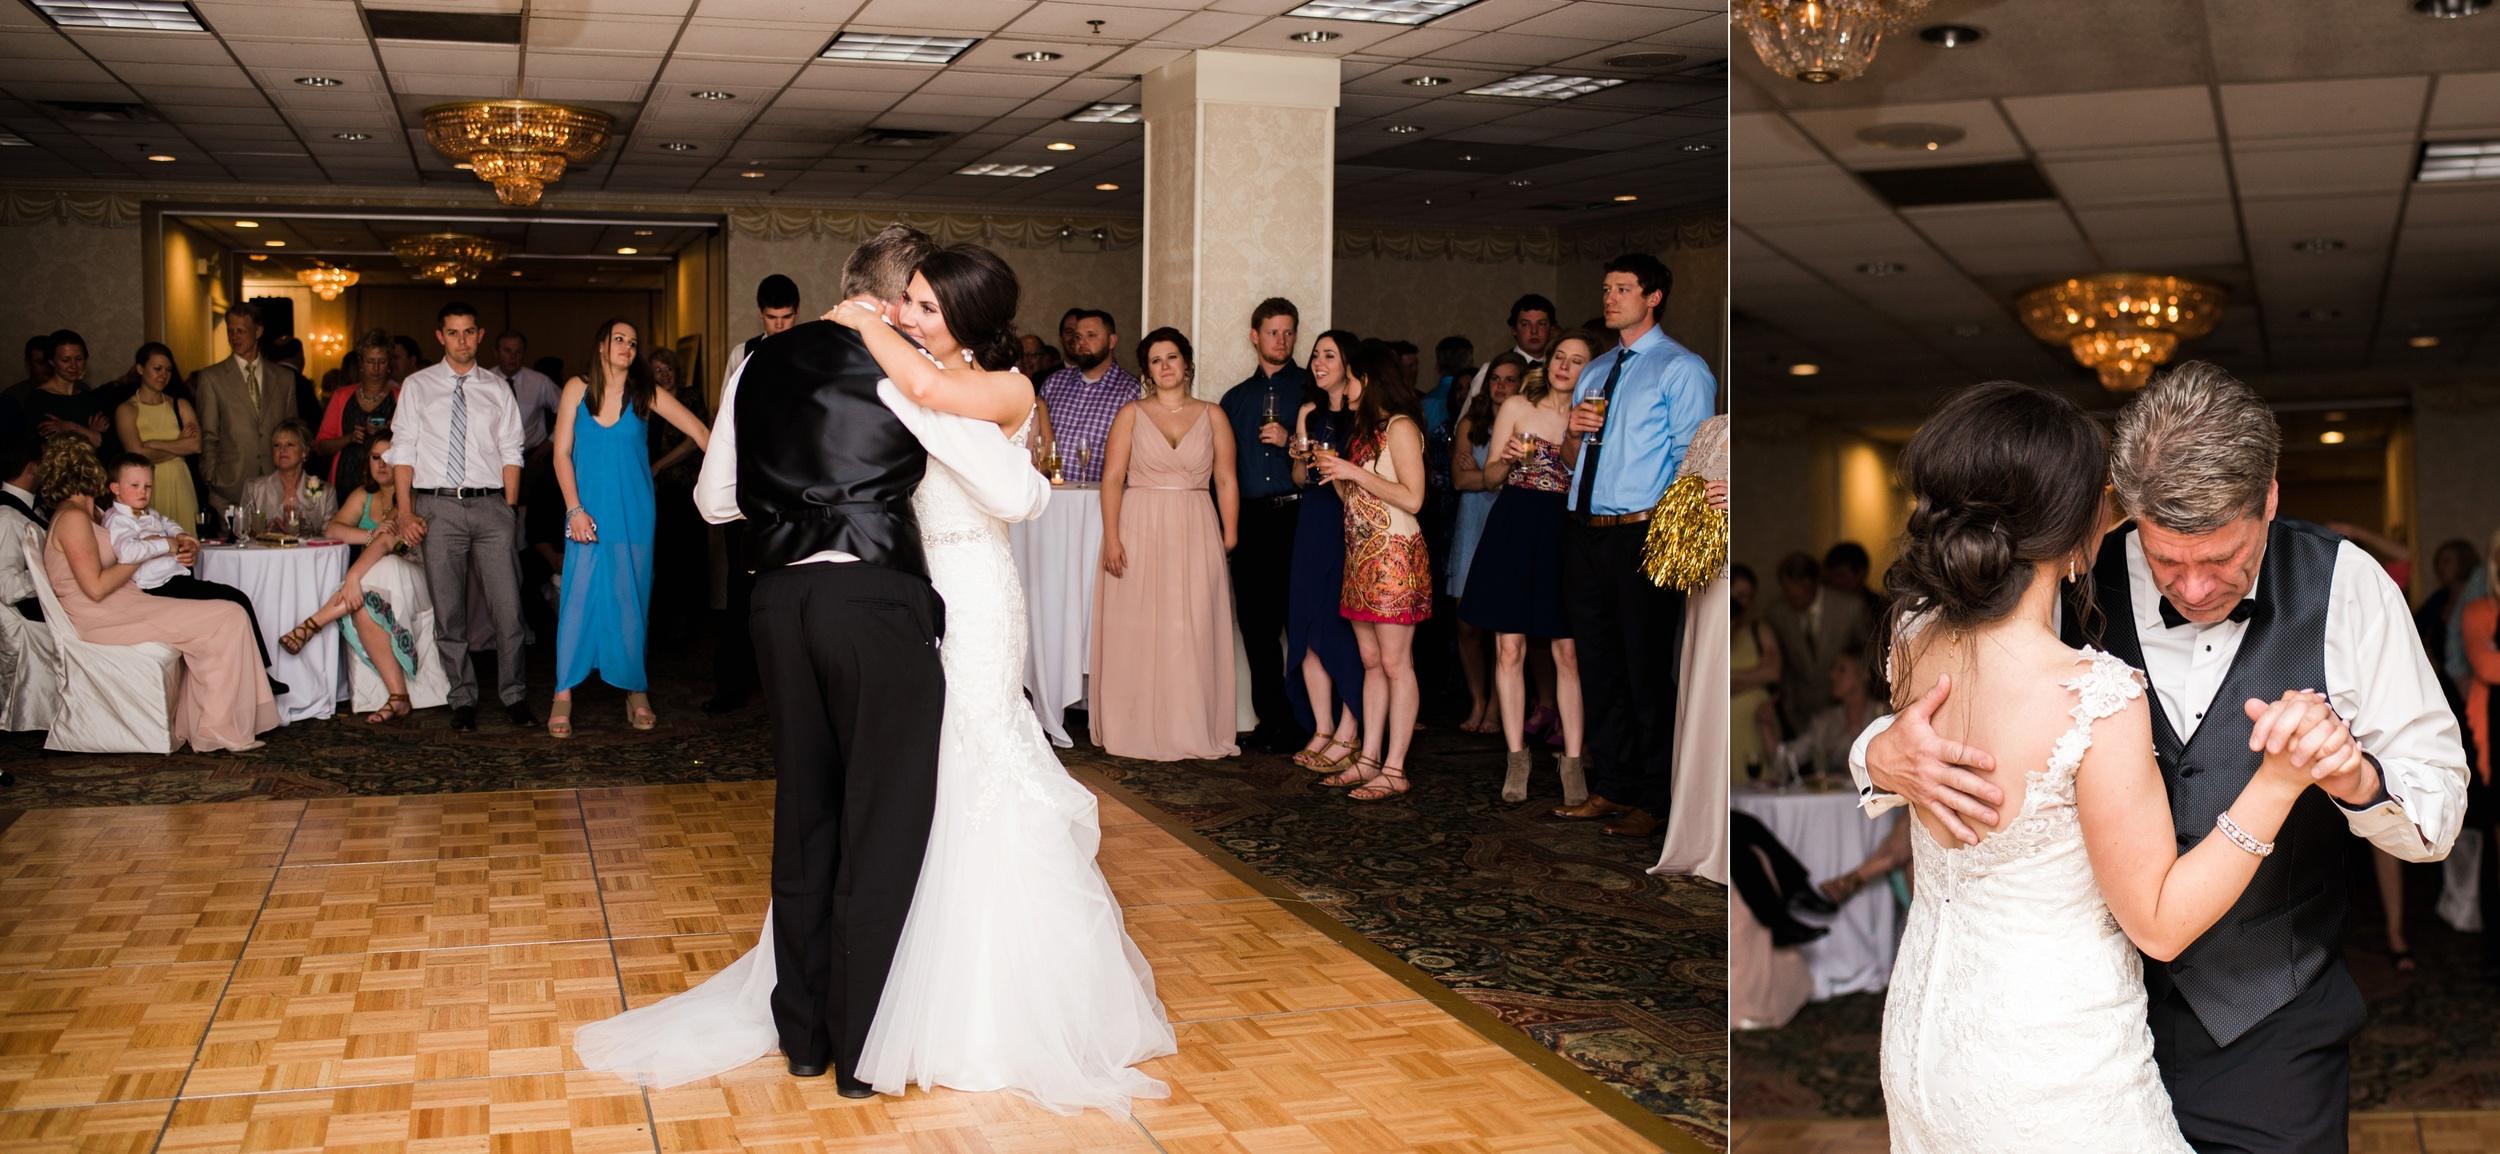 Downtown Des Moines Wedding Photographer_2144.jpg